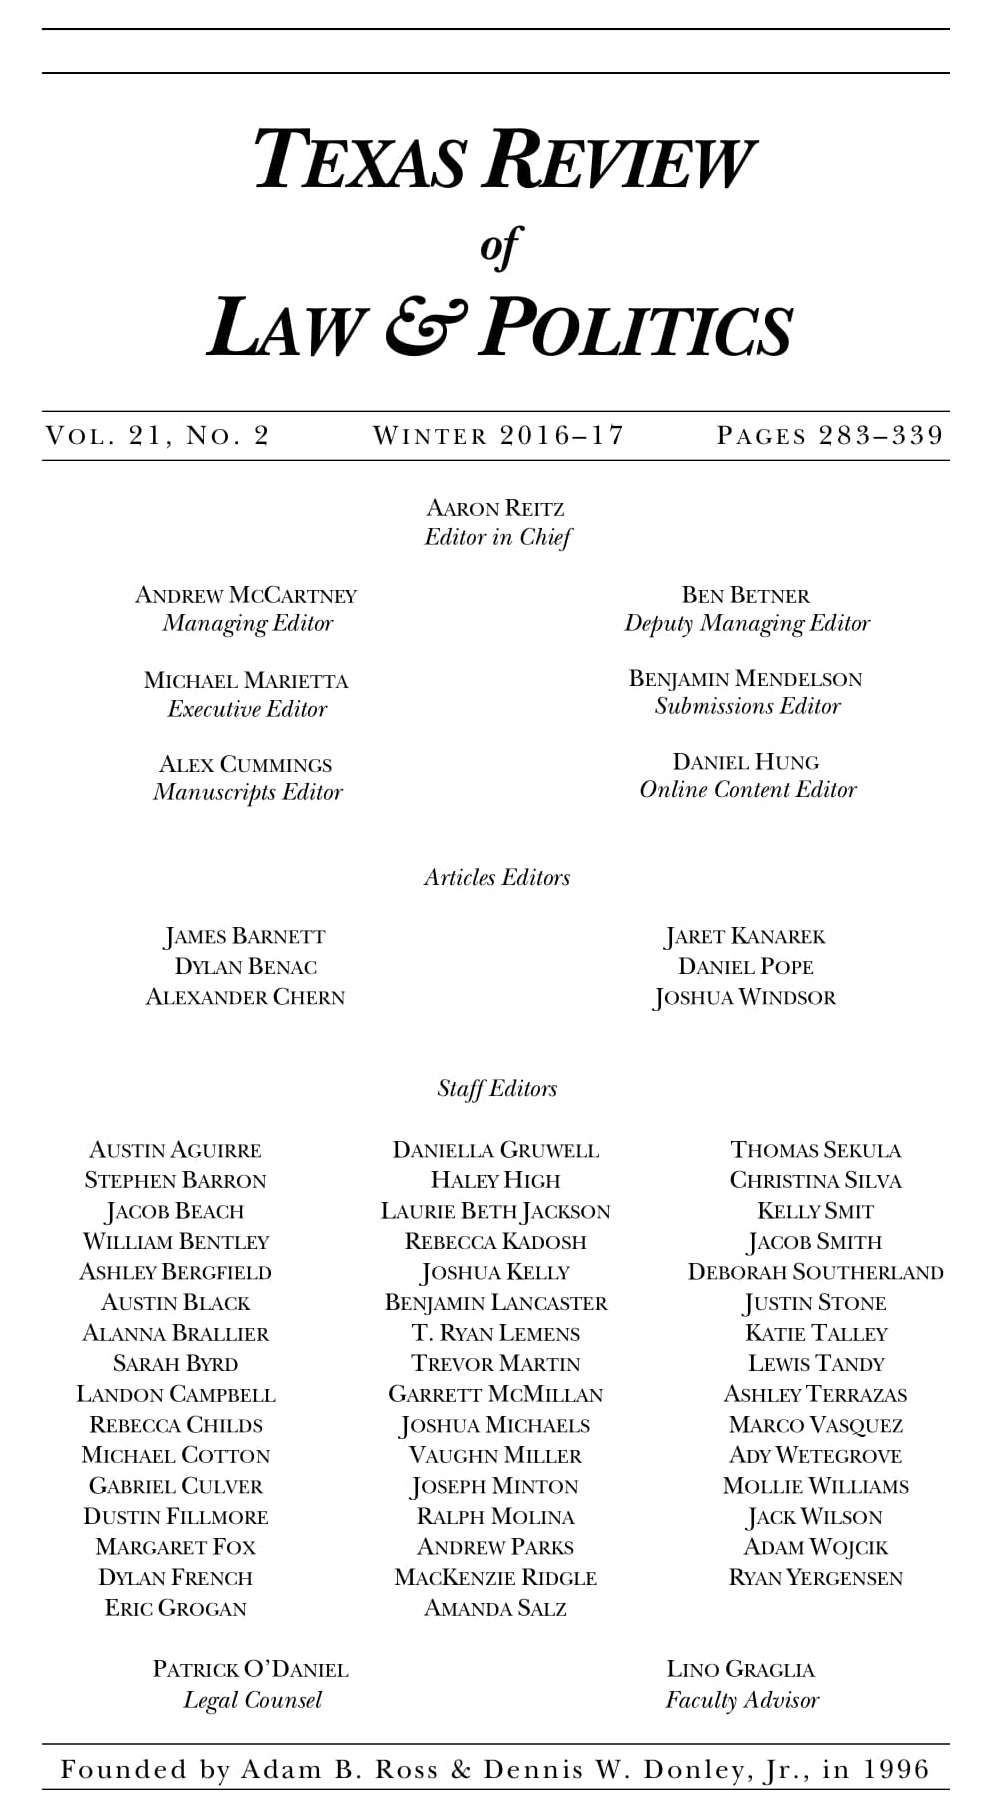 Vol 21 No 2